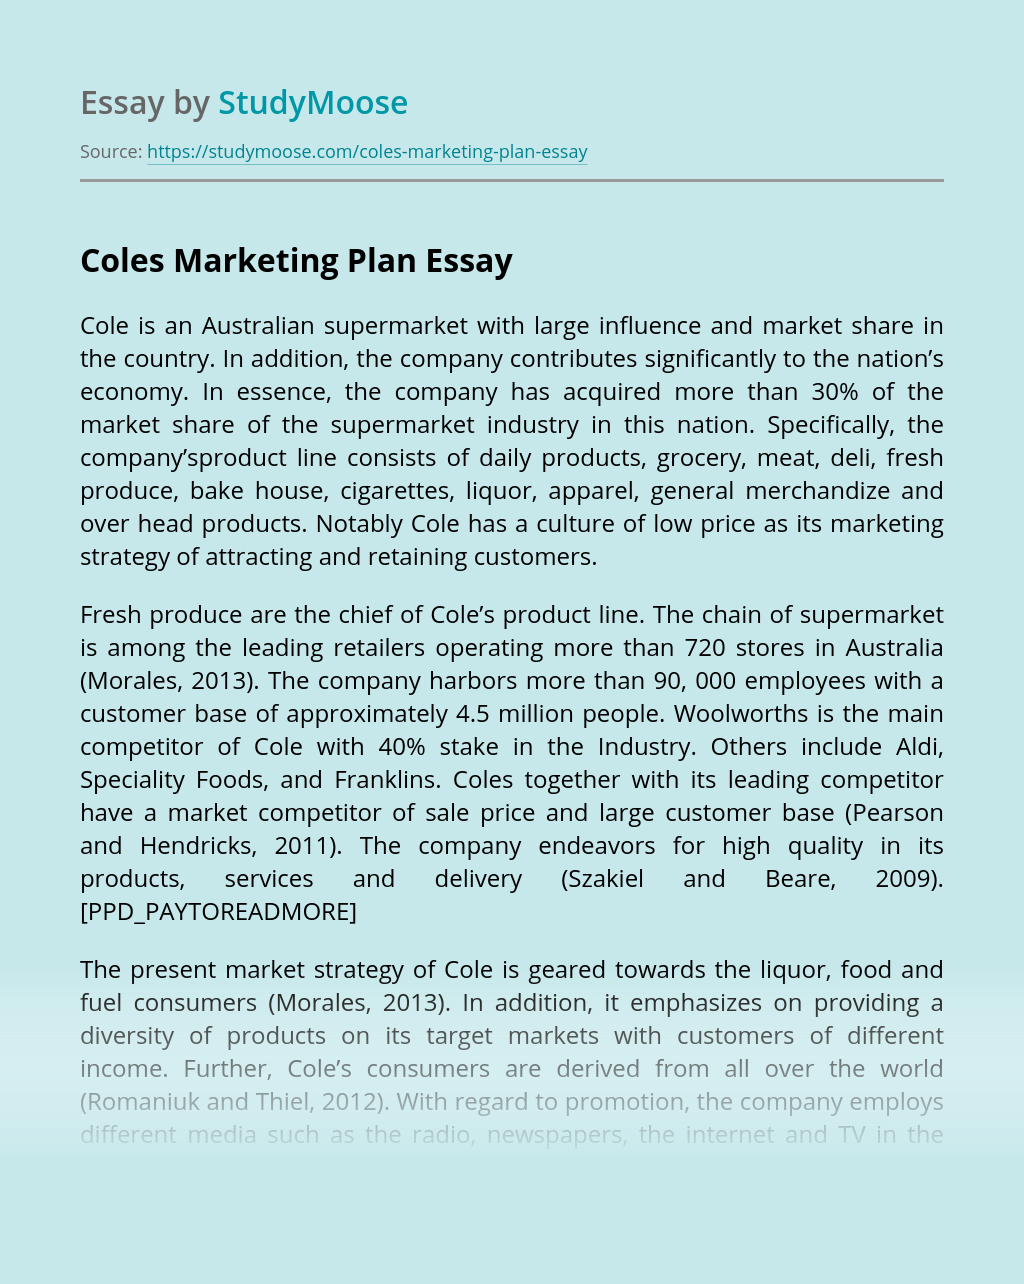 Coles Marketing Plan